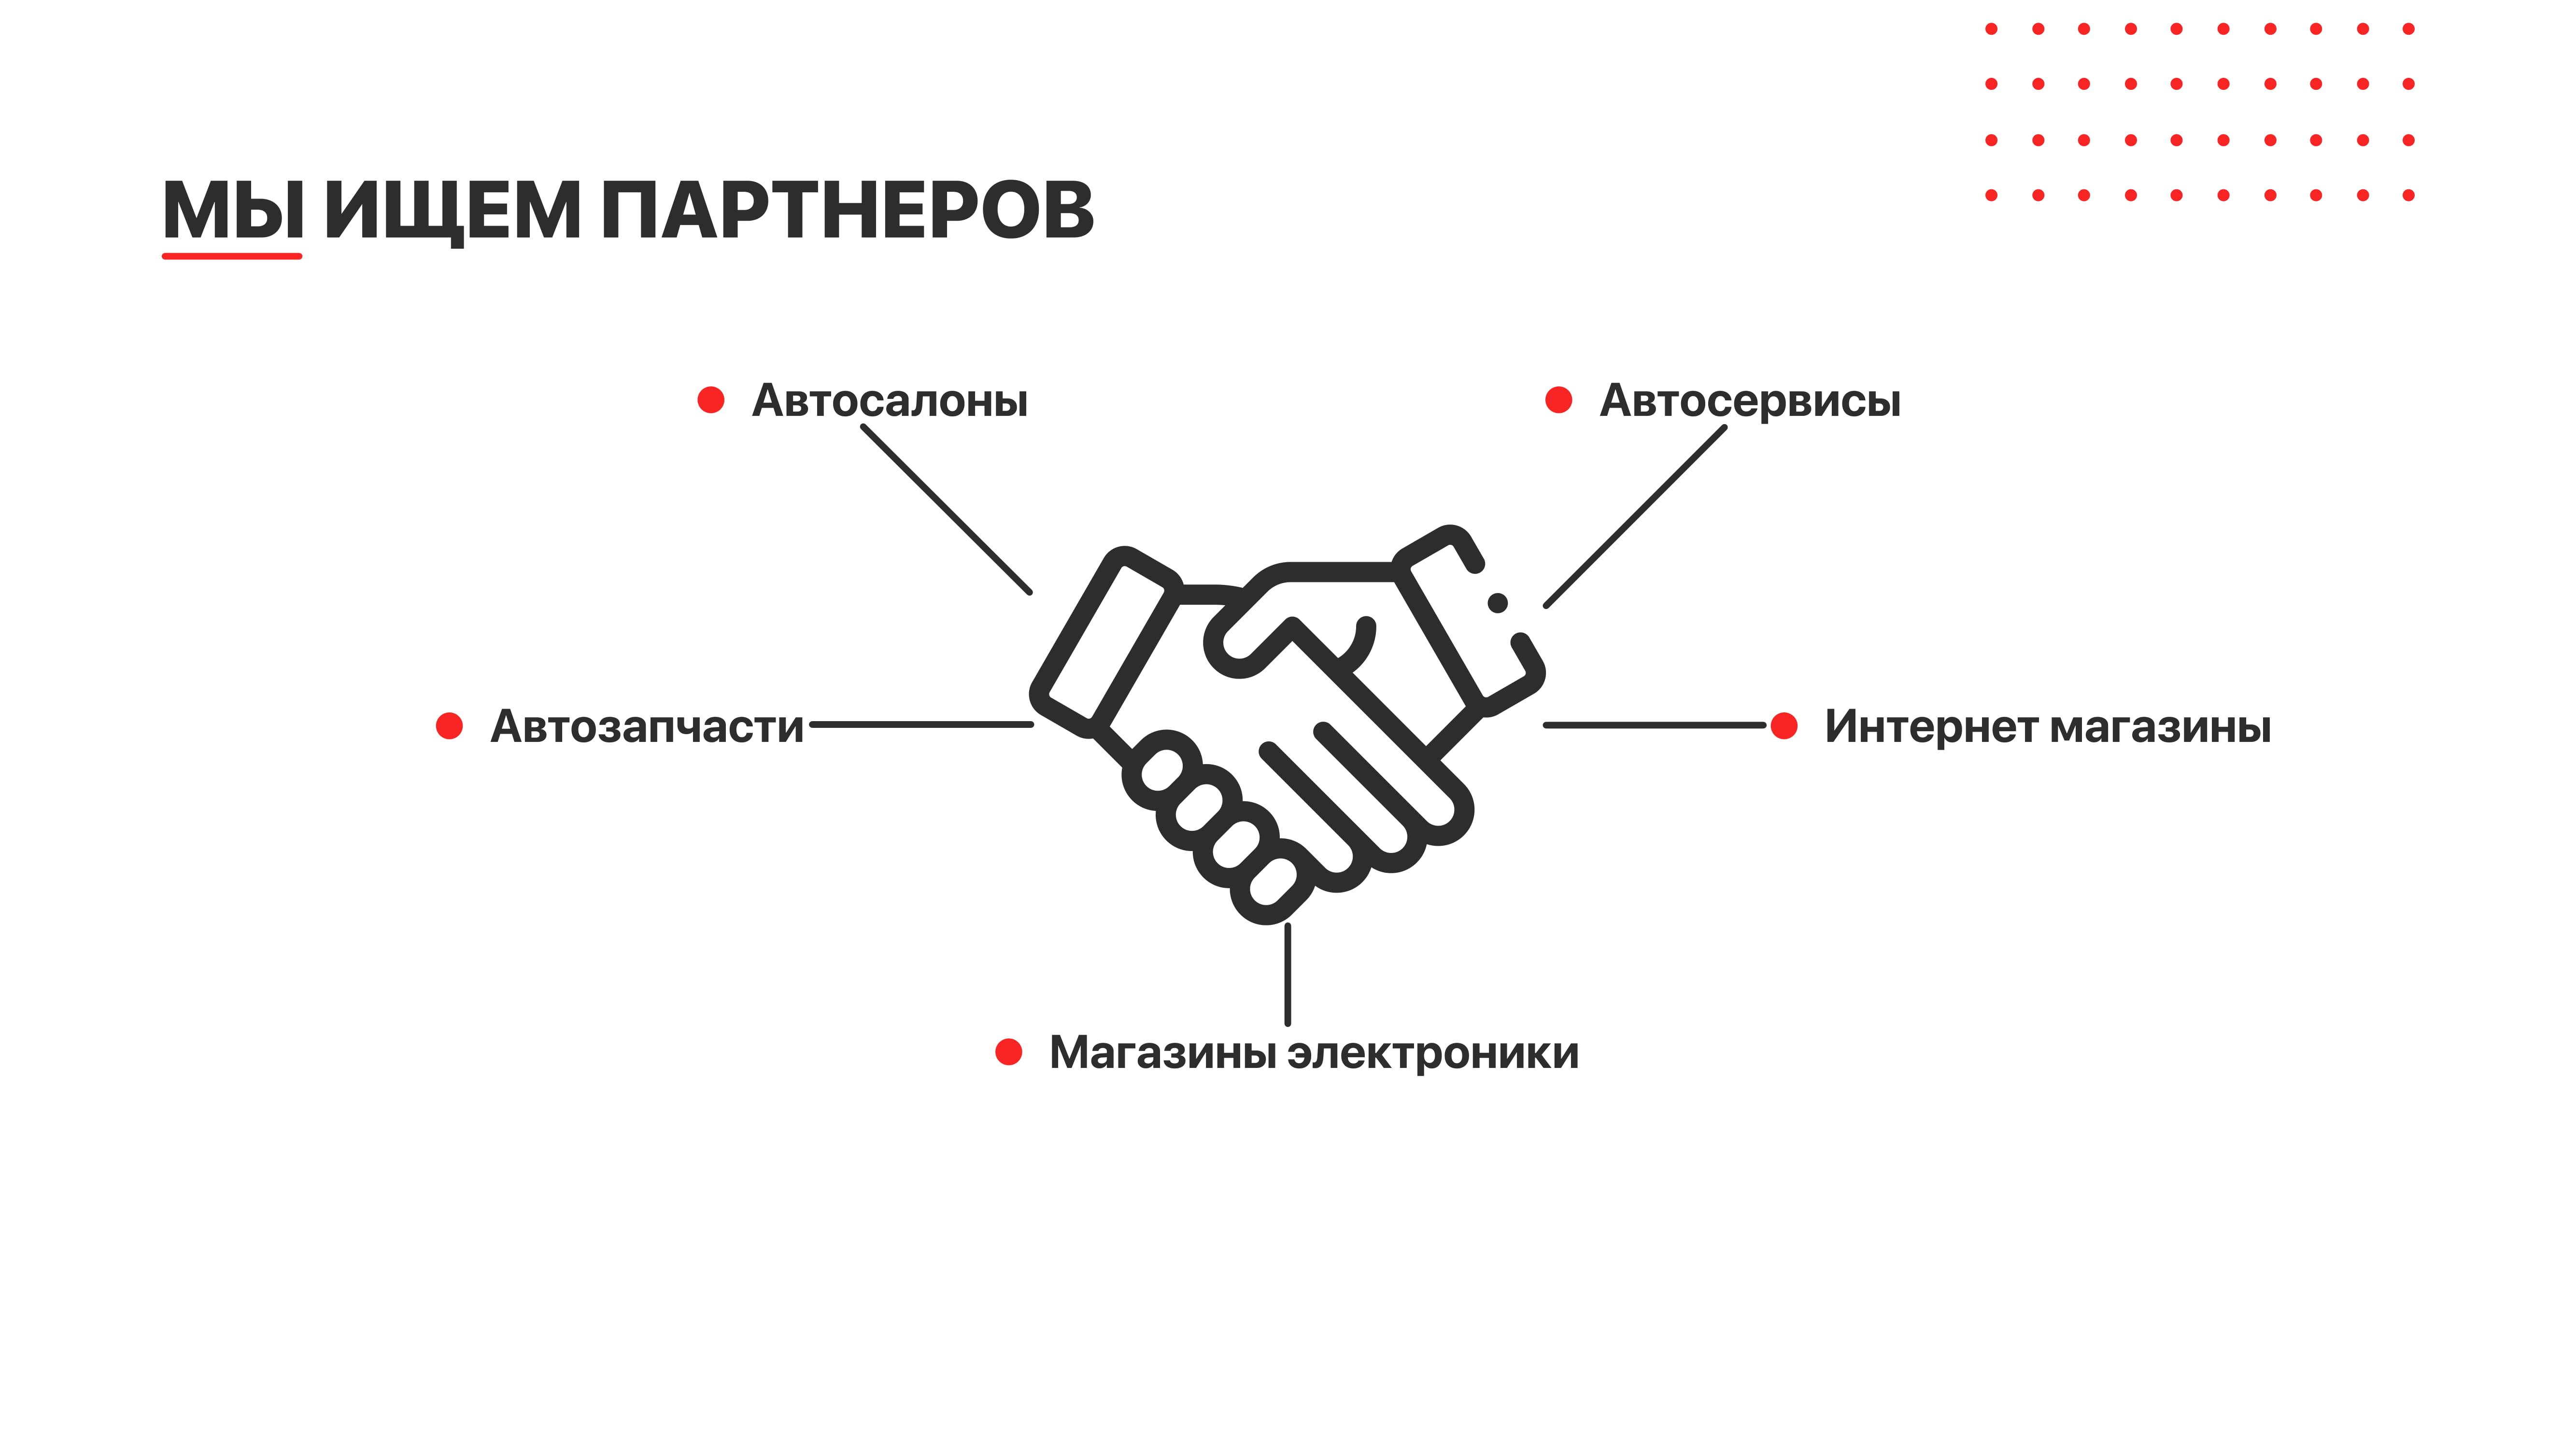 https://audiostart.ru/images/upload/Audio%20Start%20Presentation%20Print-04.jpg